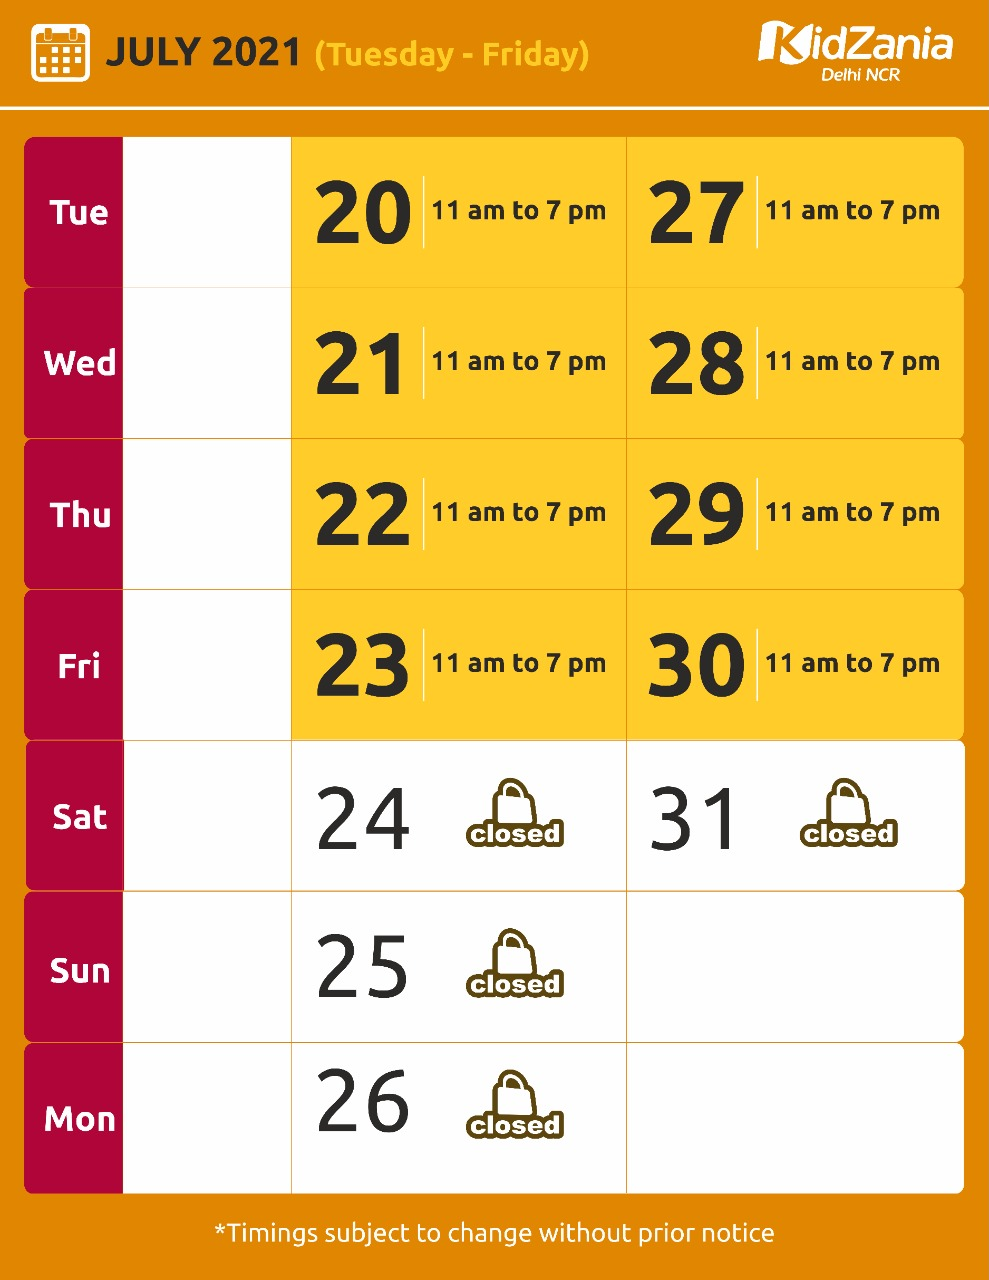 KidZania Delhi NCR Website Calendar